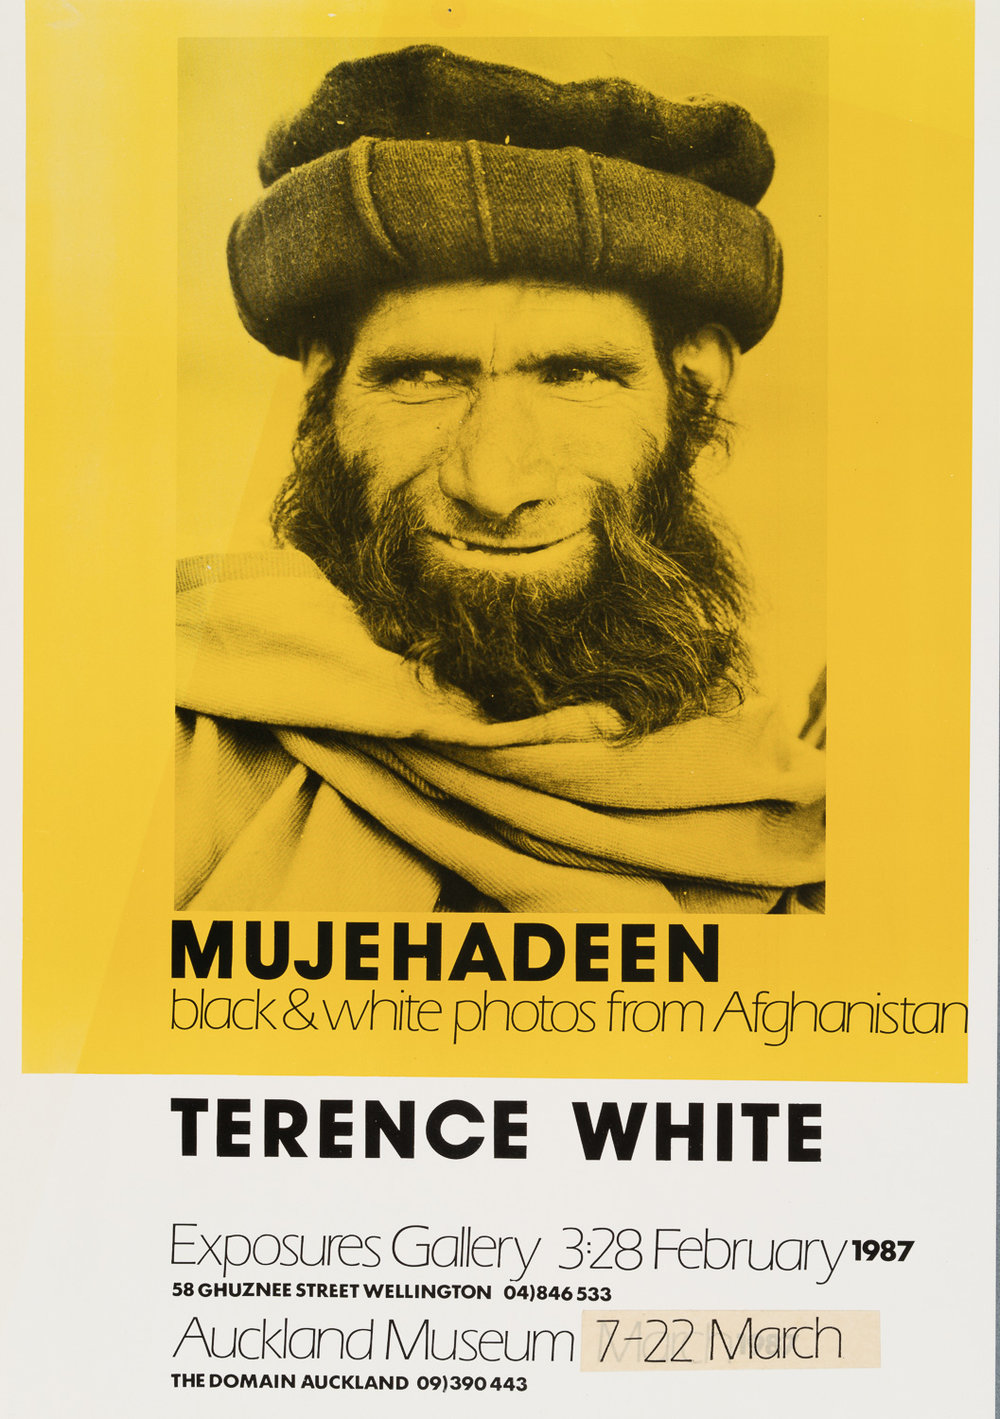 Terence WhiteMujehadeen3 – 28 February 1987